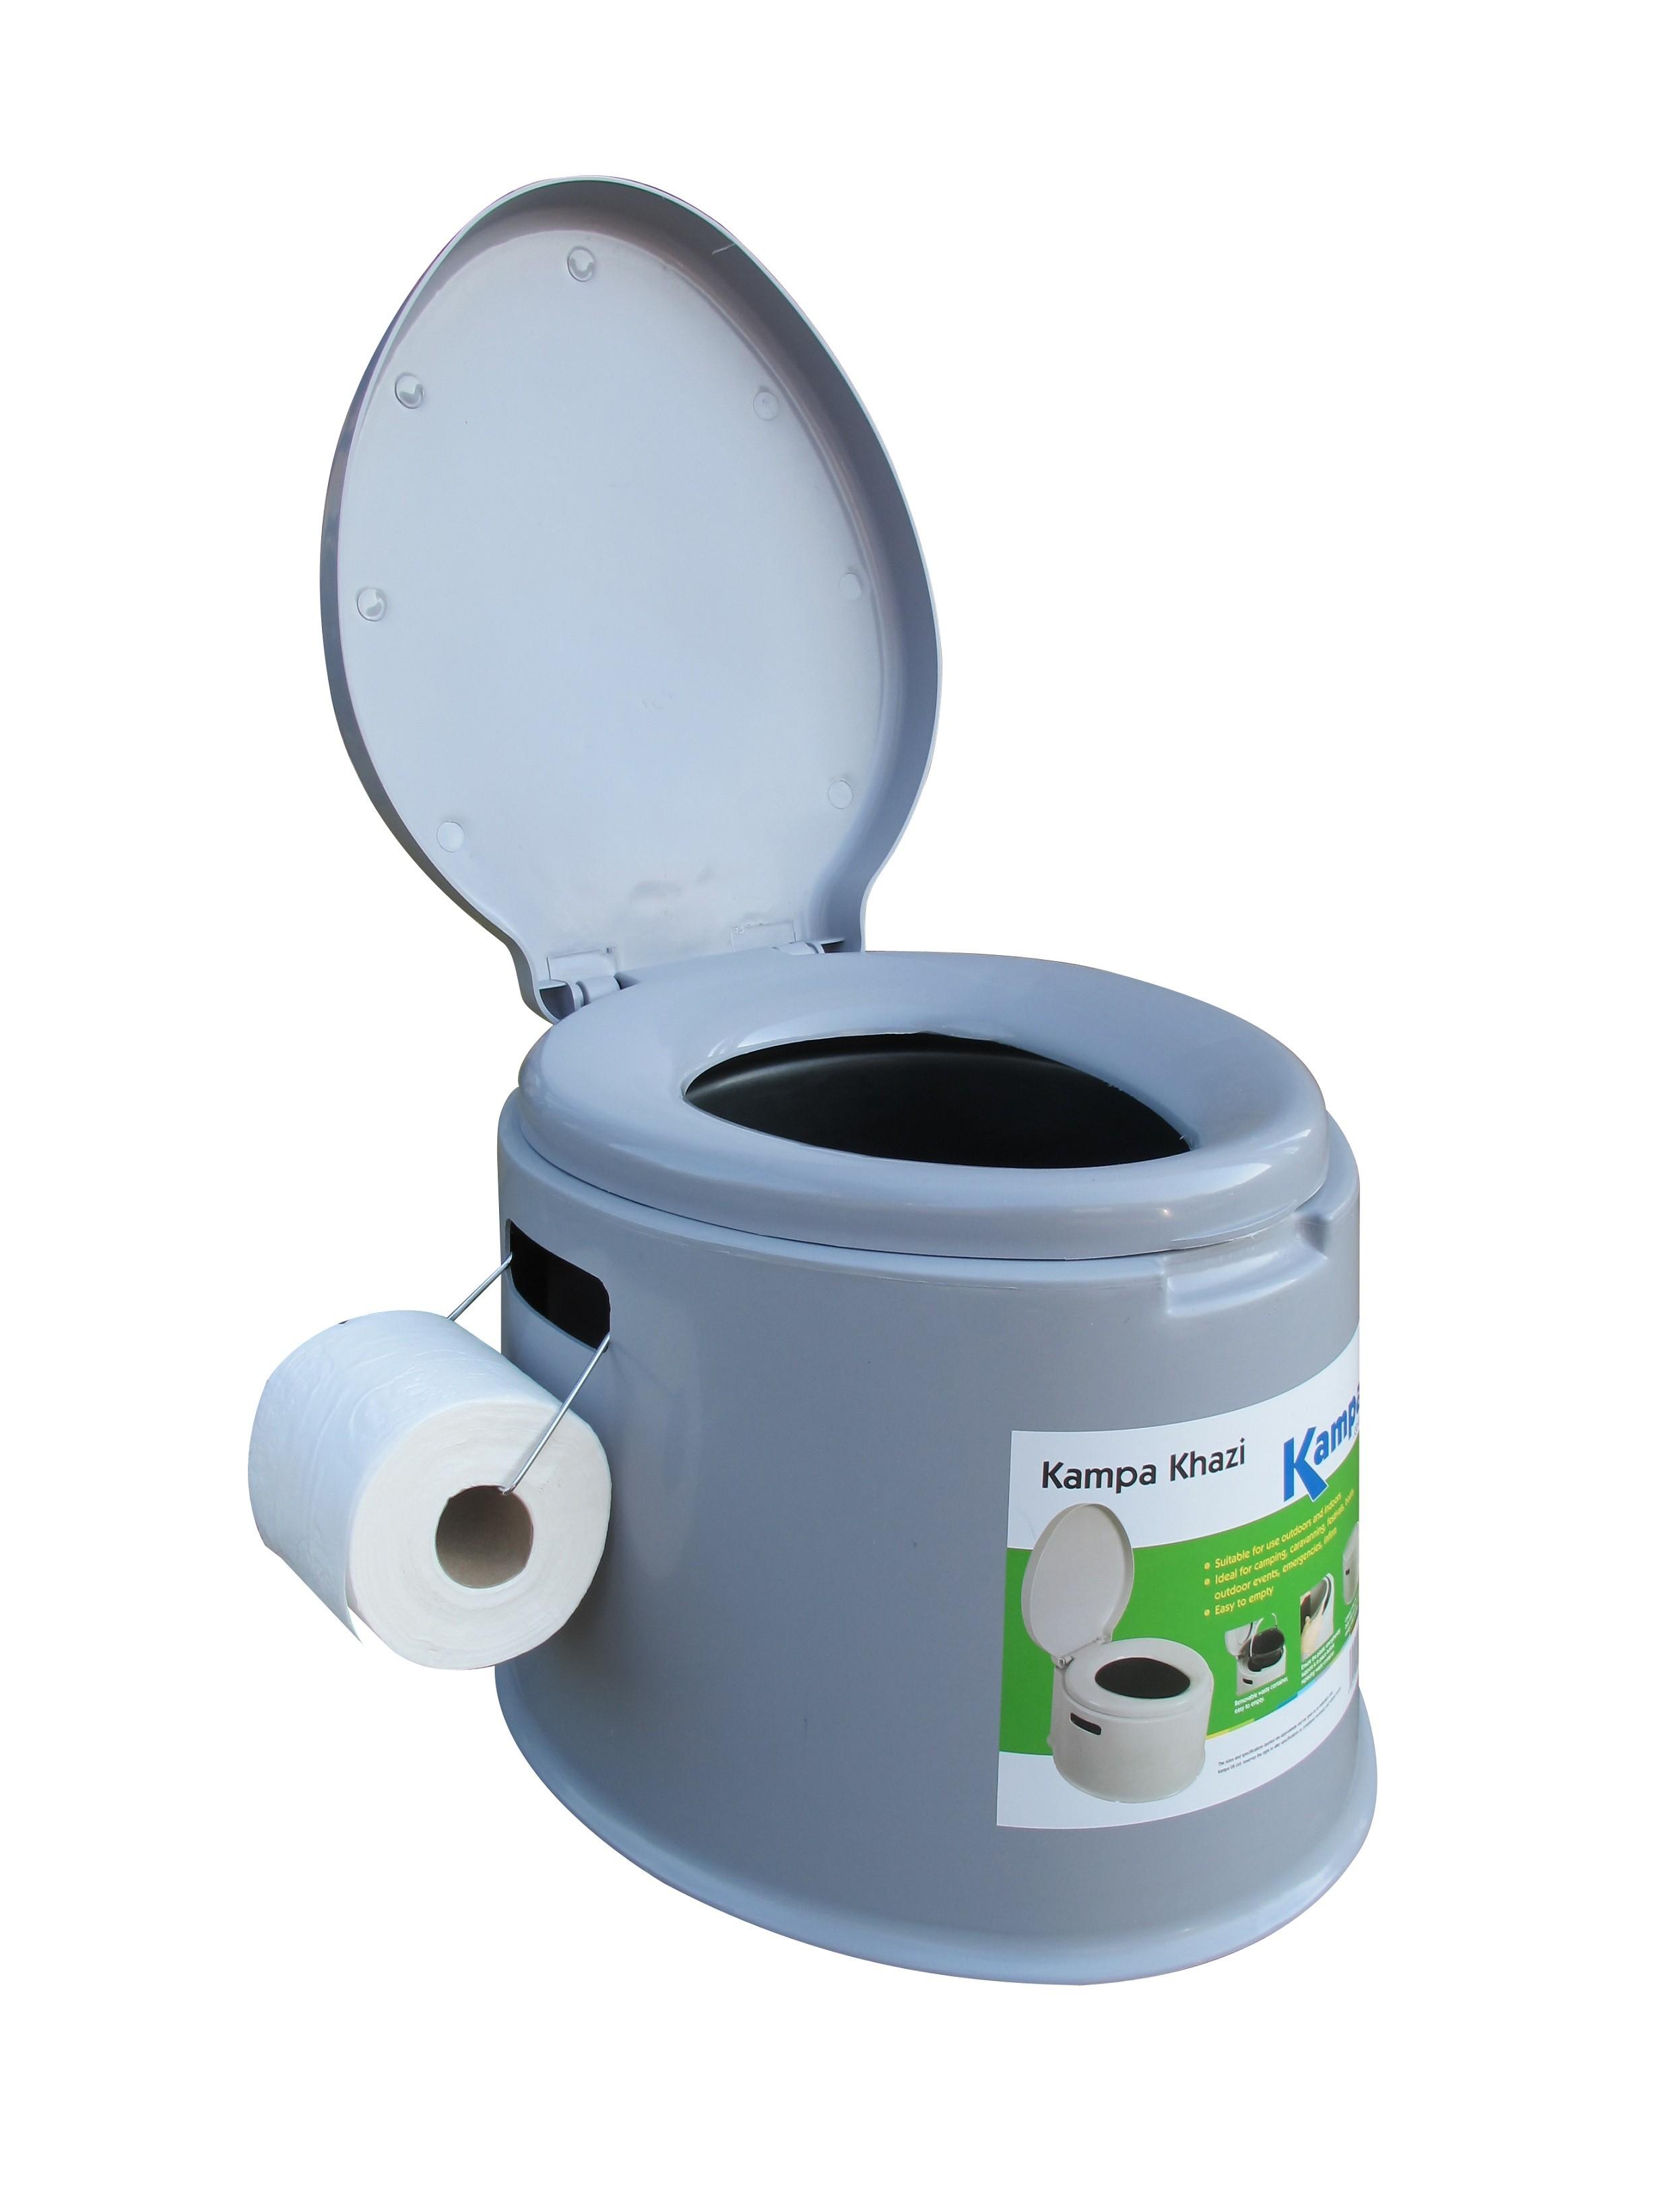 Kampa Khazi Portable Toilet By Kampa For 163 26 00